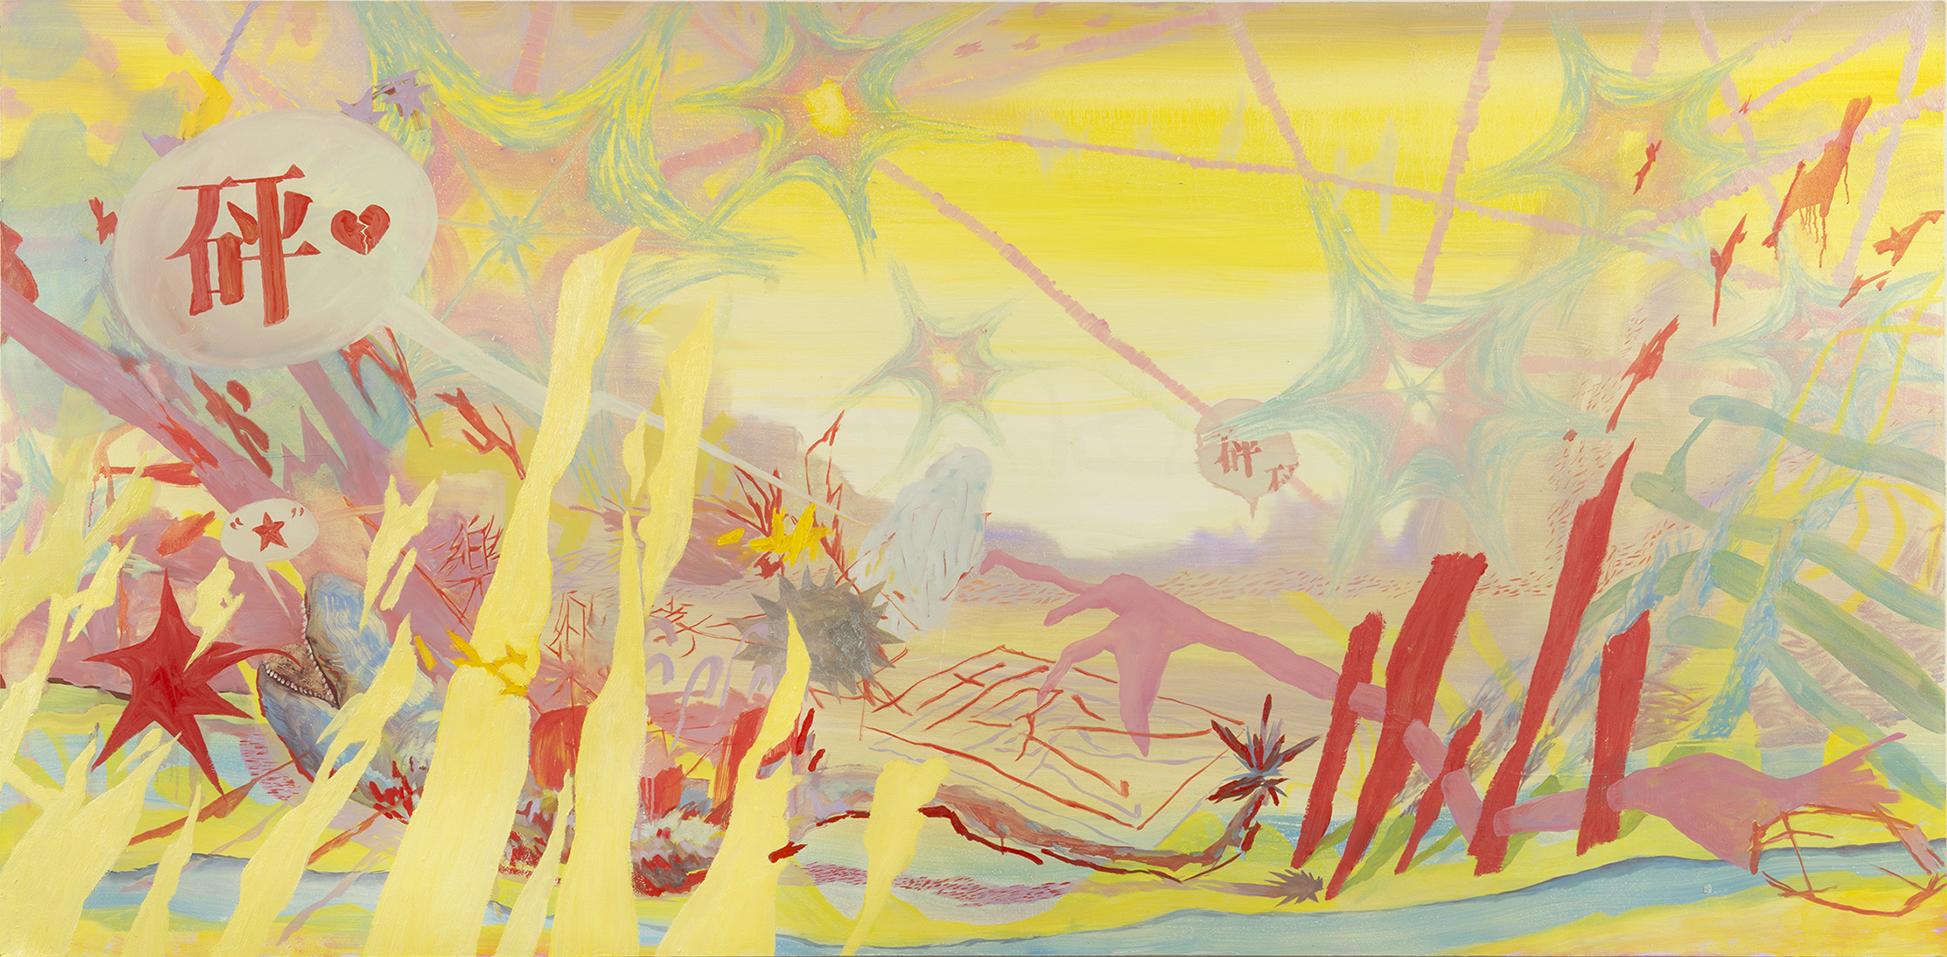 Bang! Paradise. Xiaofu Wang. 2016. Oil on panel. 48 x 96 inches